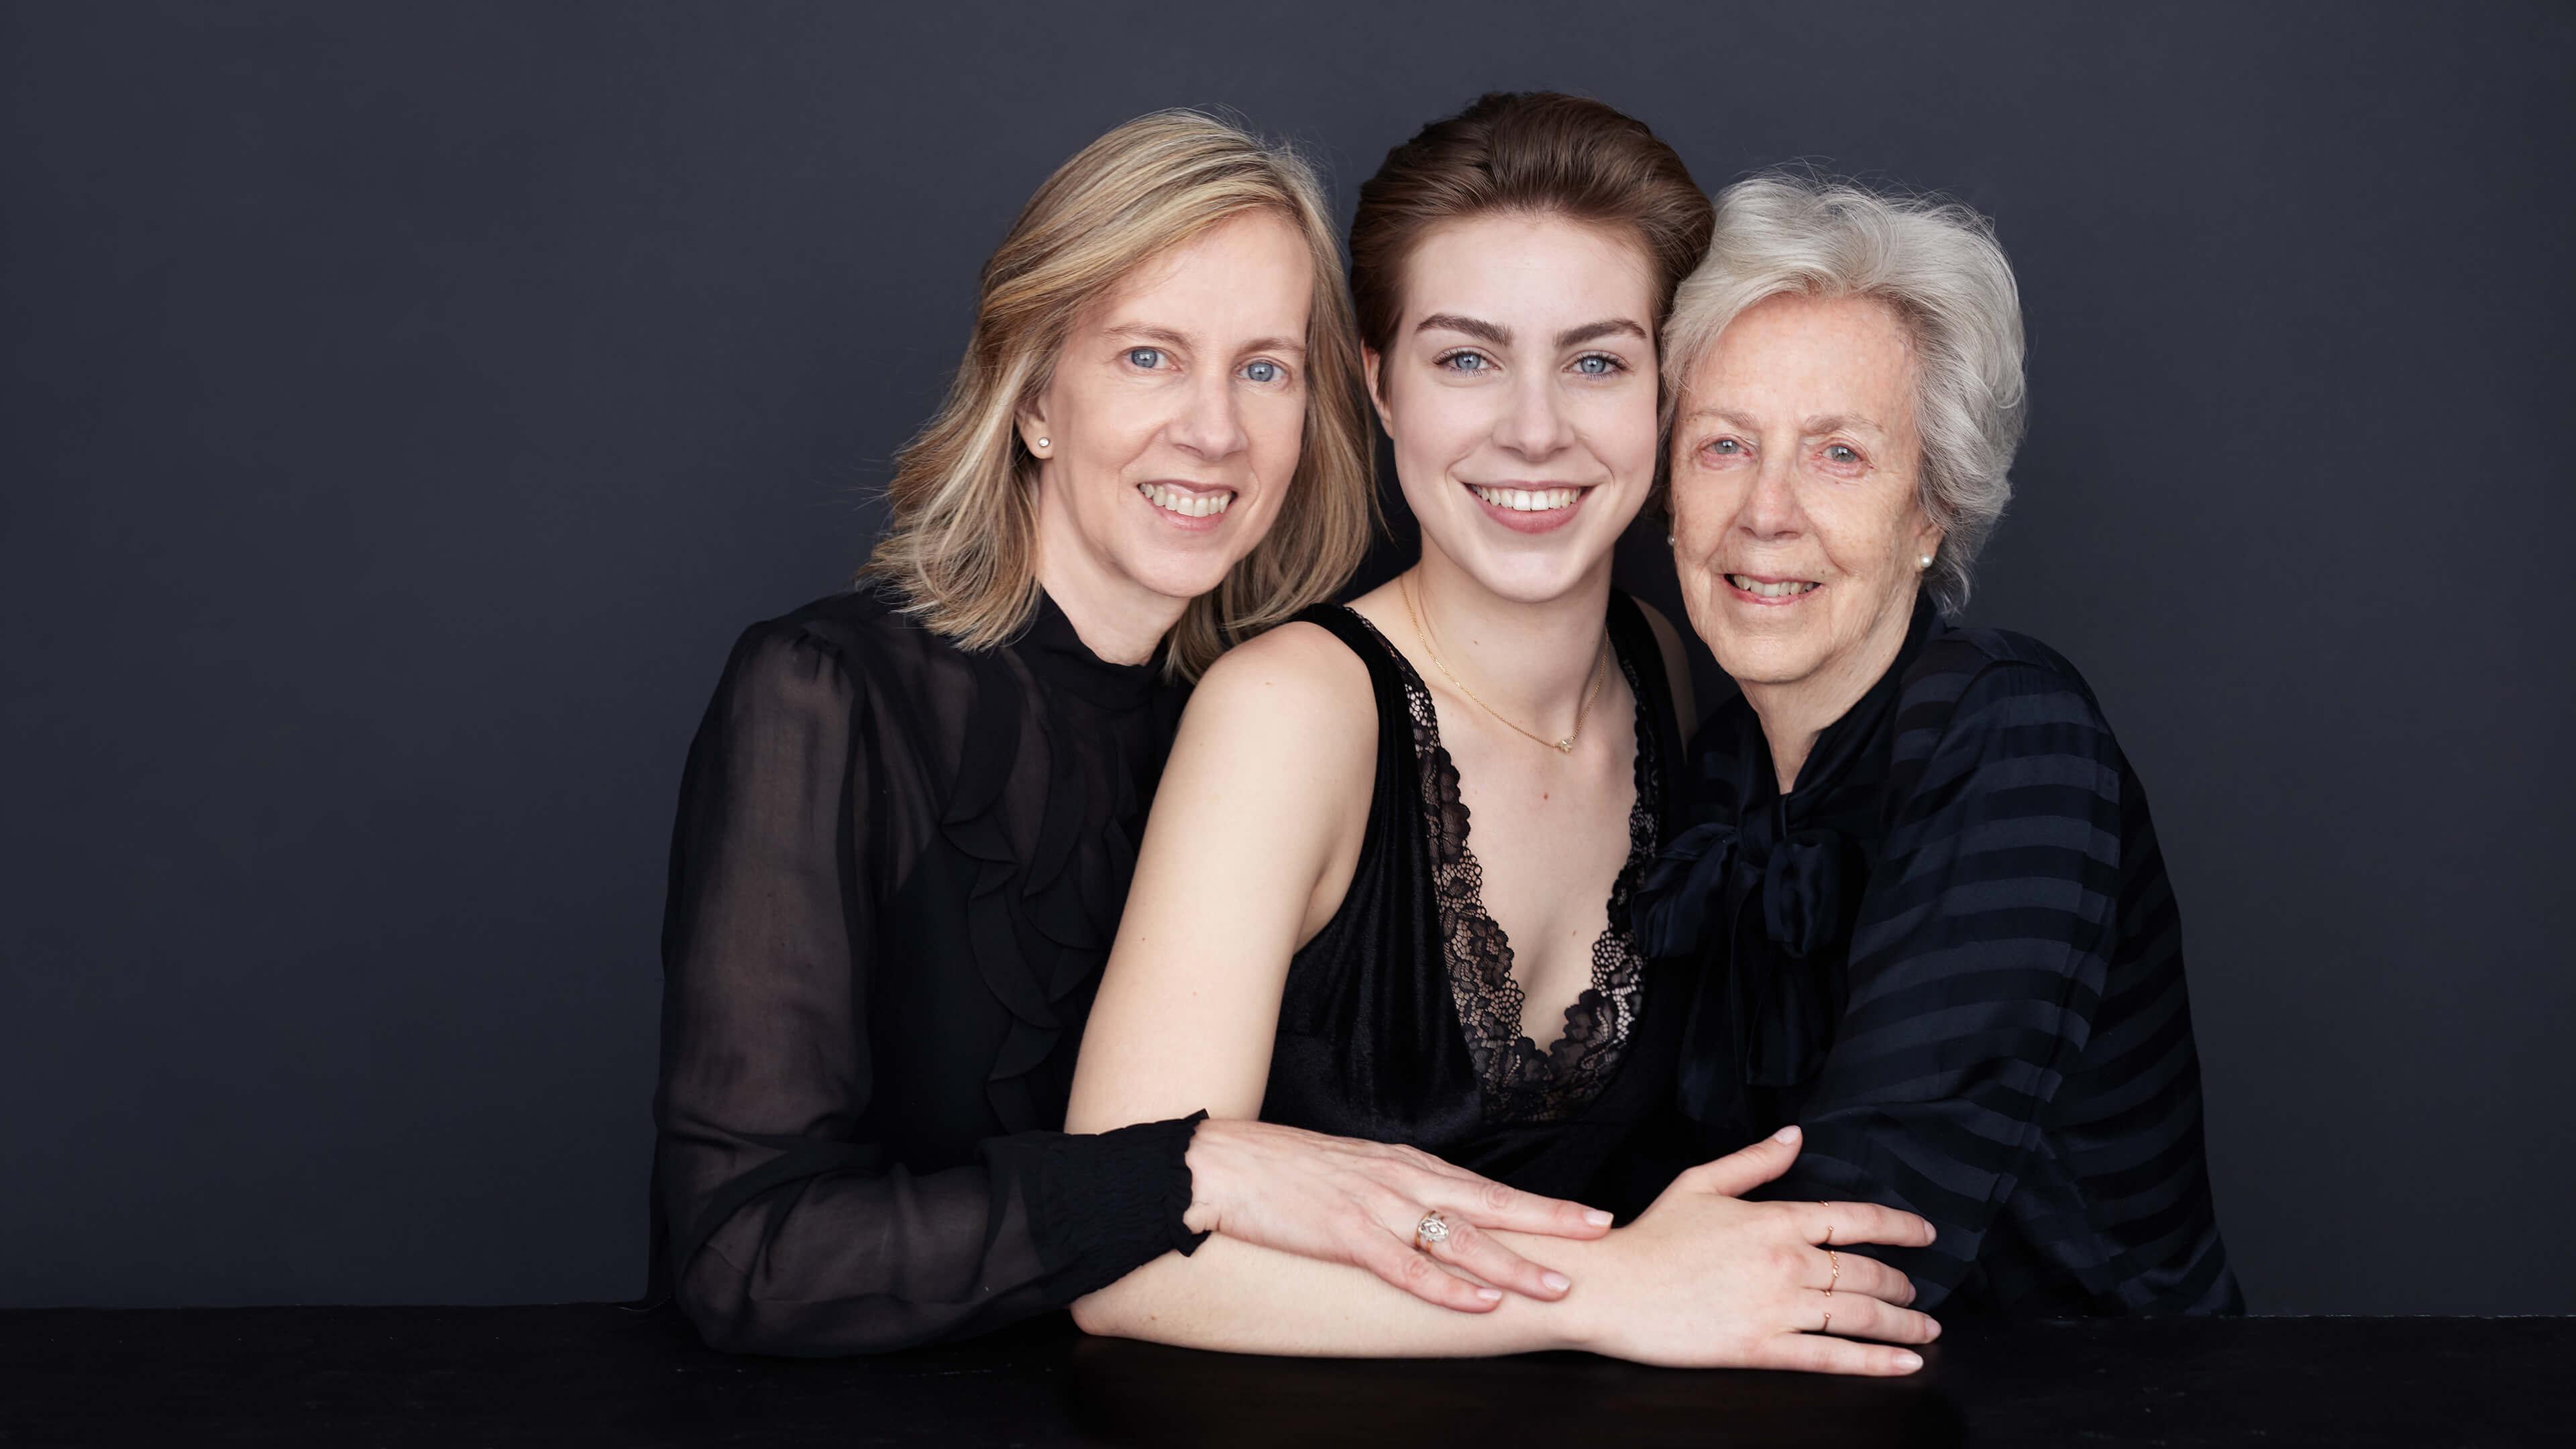 foto de tres generaciones